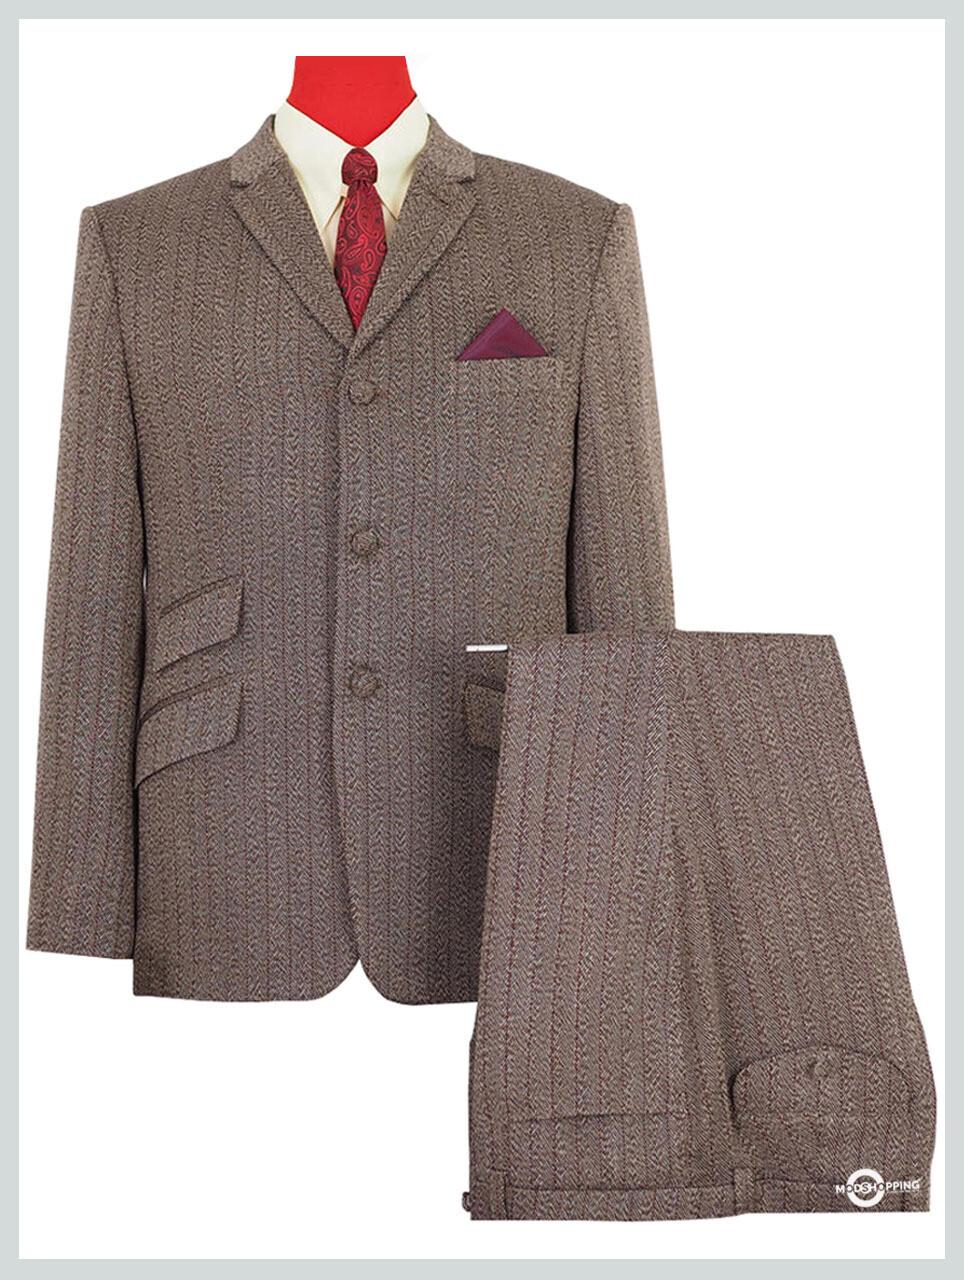 Tweed Suit Brown Stripe 60s Style Mod Suit